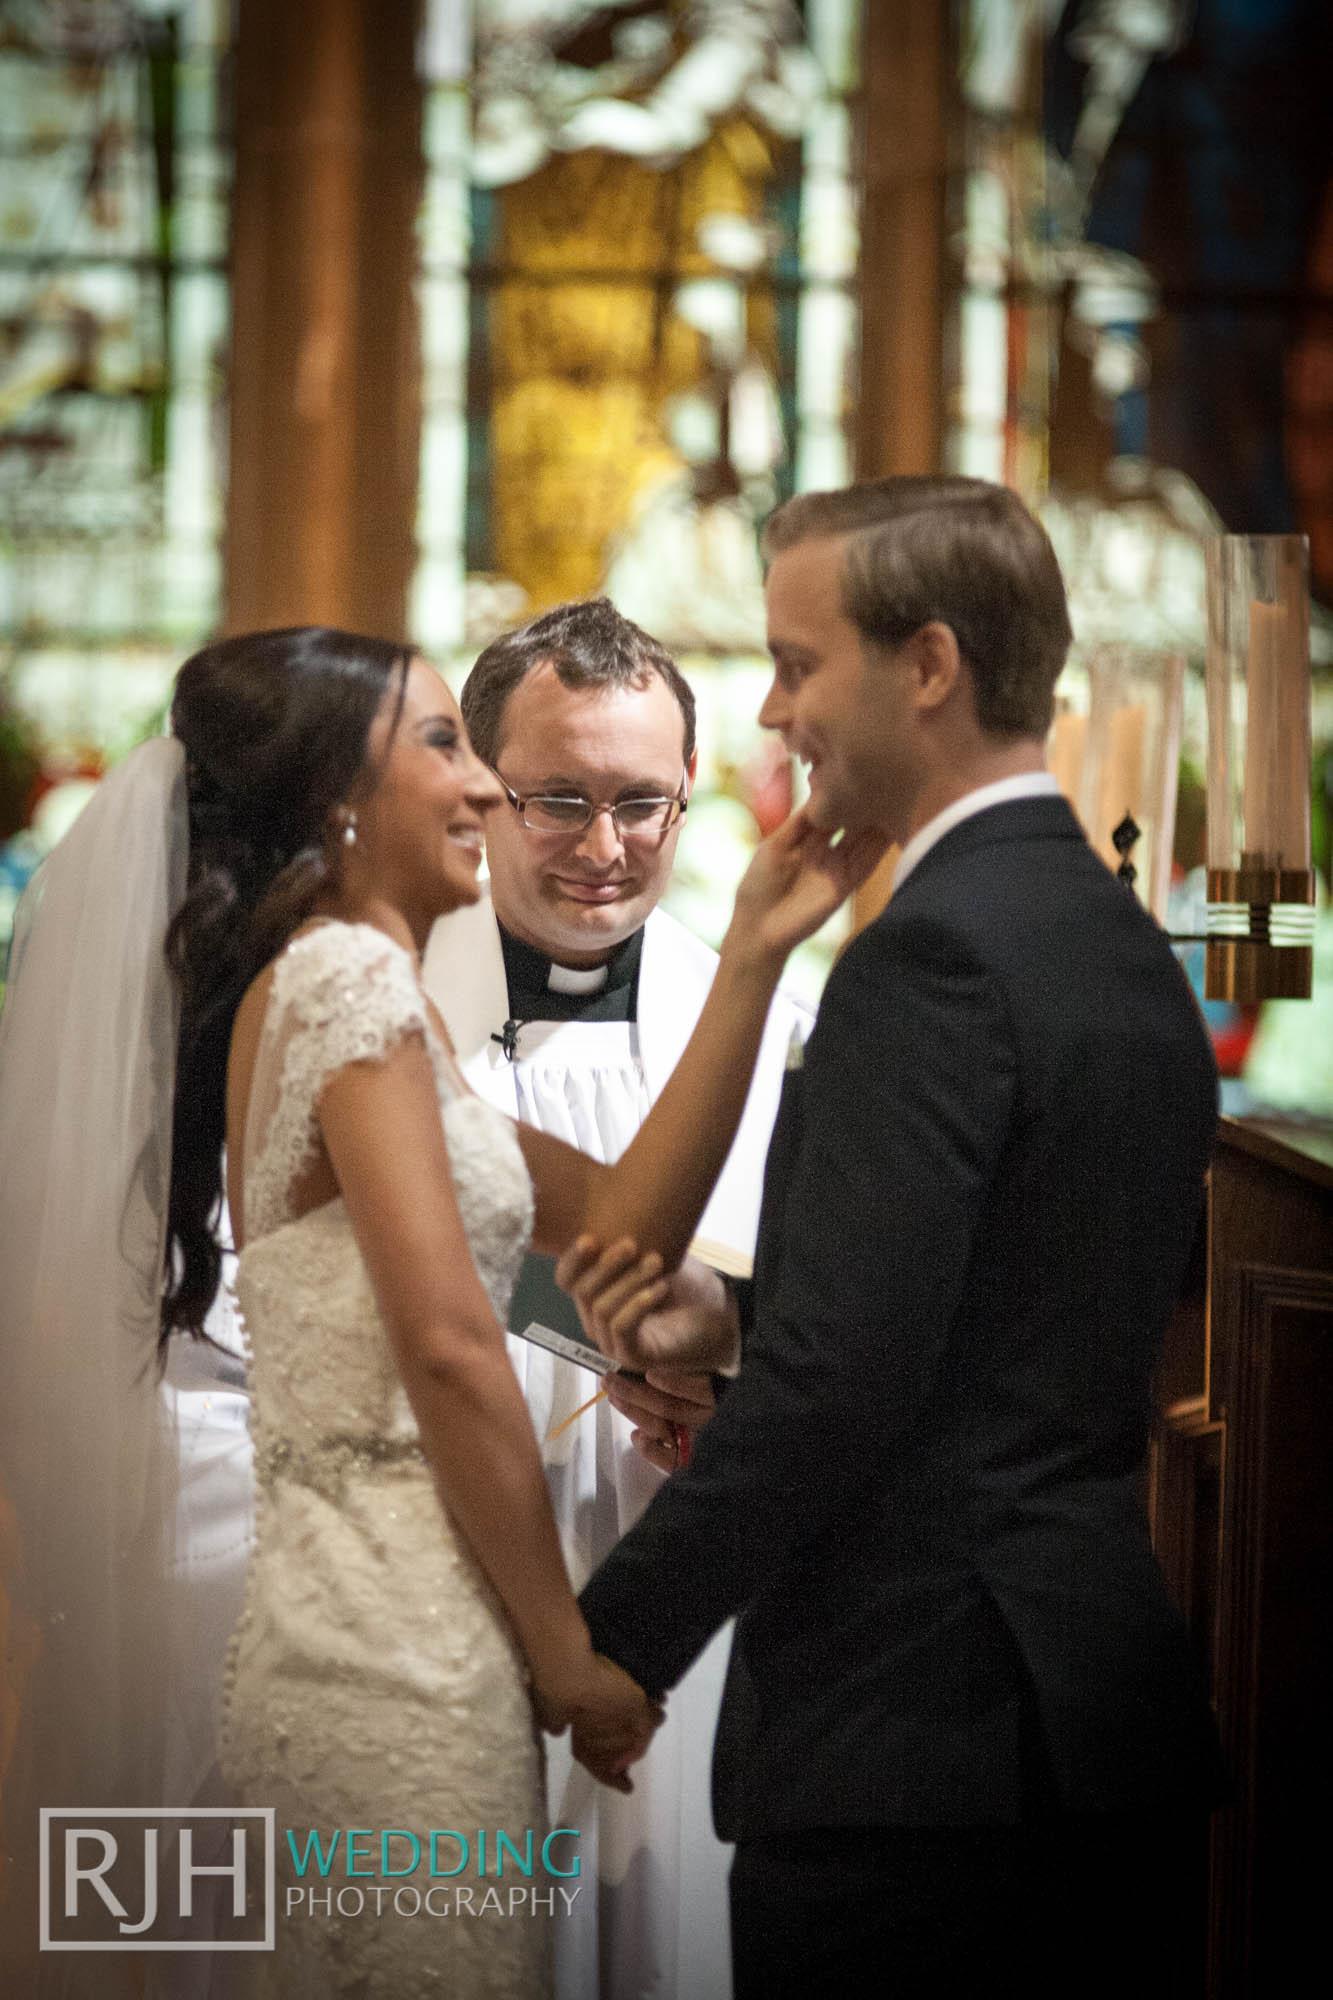 RJH Wedding Photography_Tankersley Manor Wedding_22.jpg